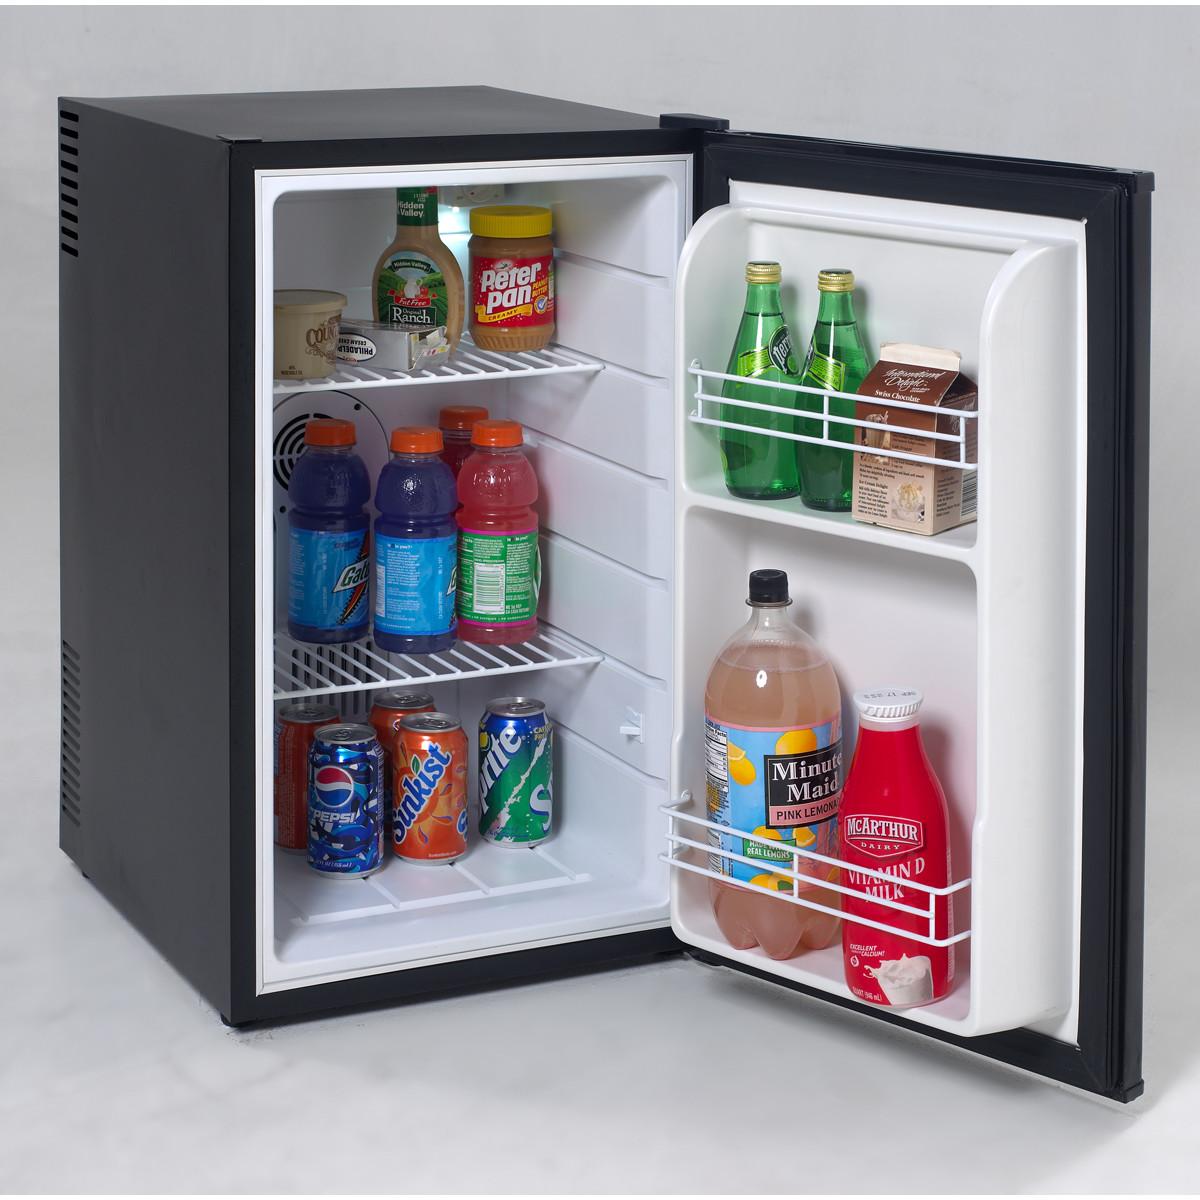 7.4 Cubic Feet Refrigerator | Compact Refrigerator Freezers | Avanti Refrigerator